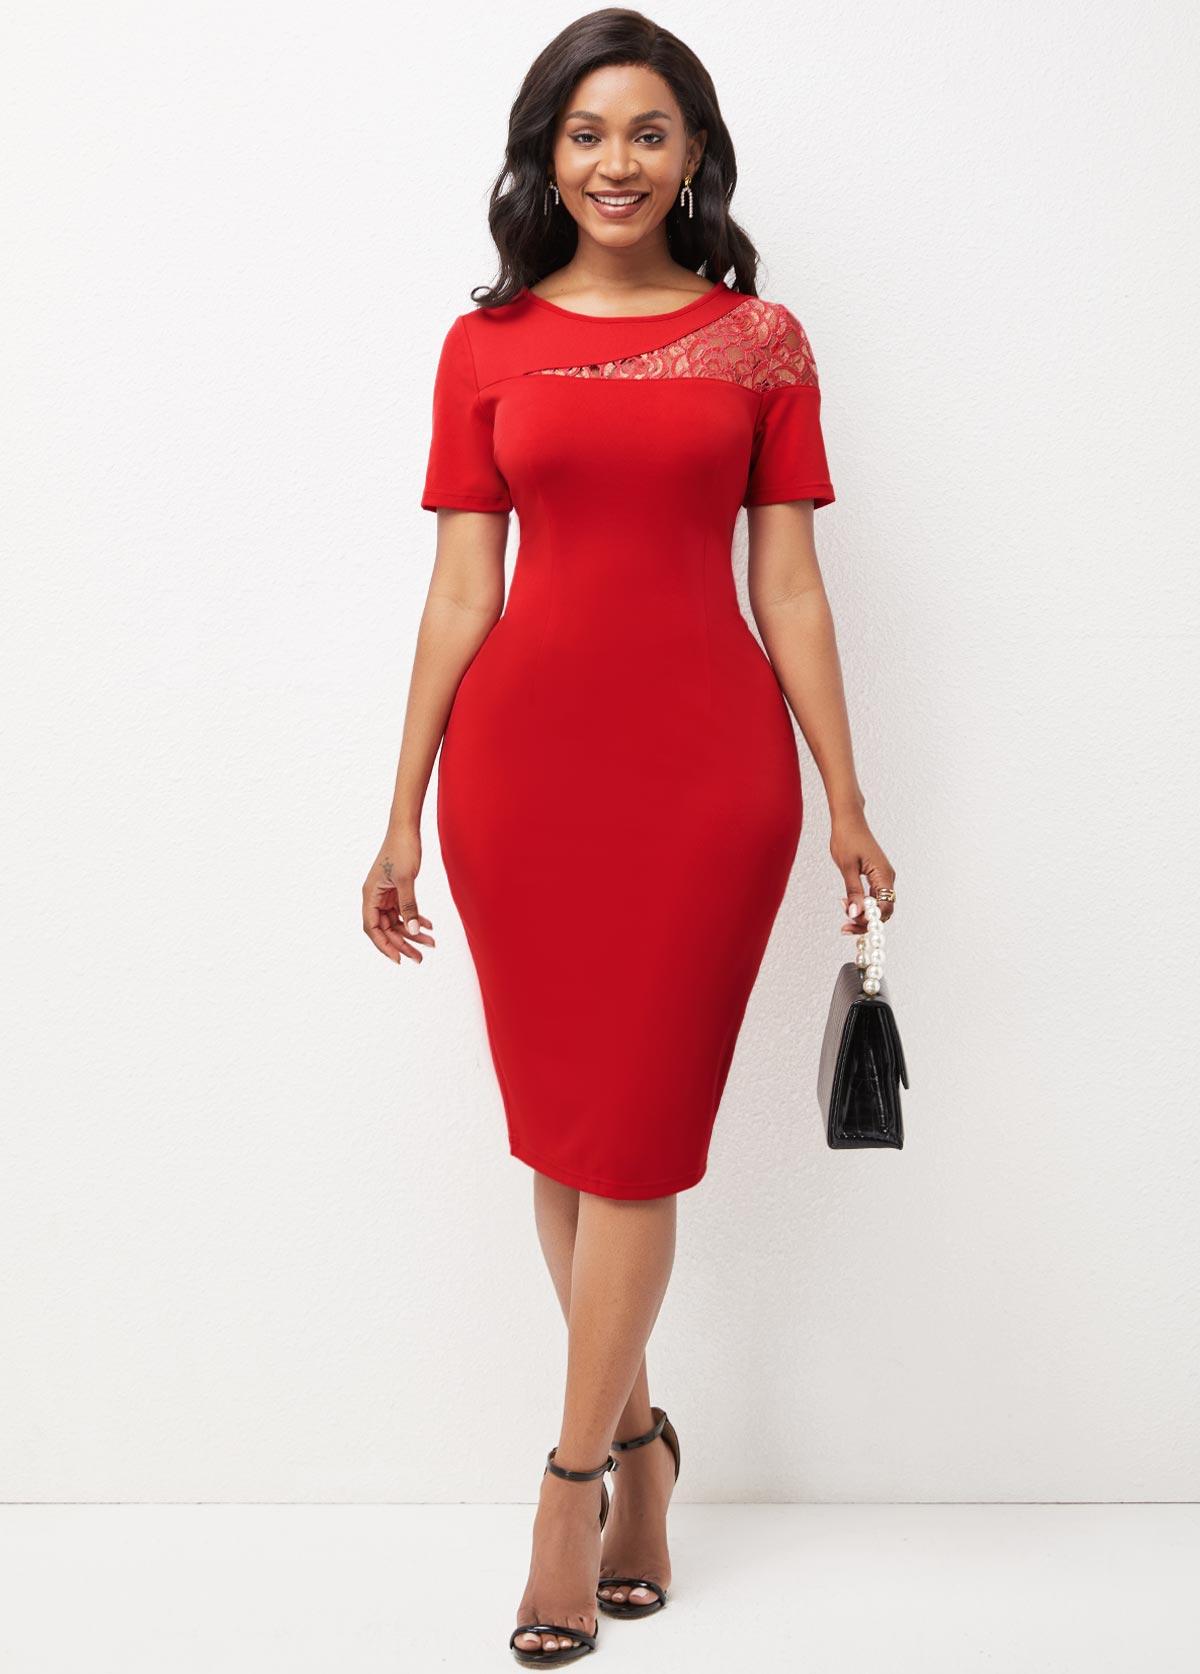 ROTITA Lace Patchwork Round Neck Short Sleeve Dress